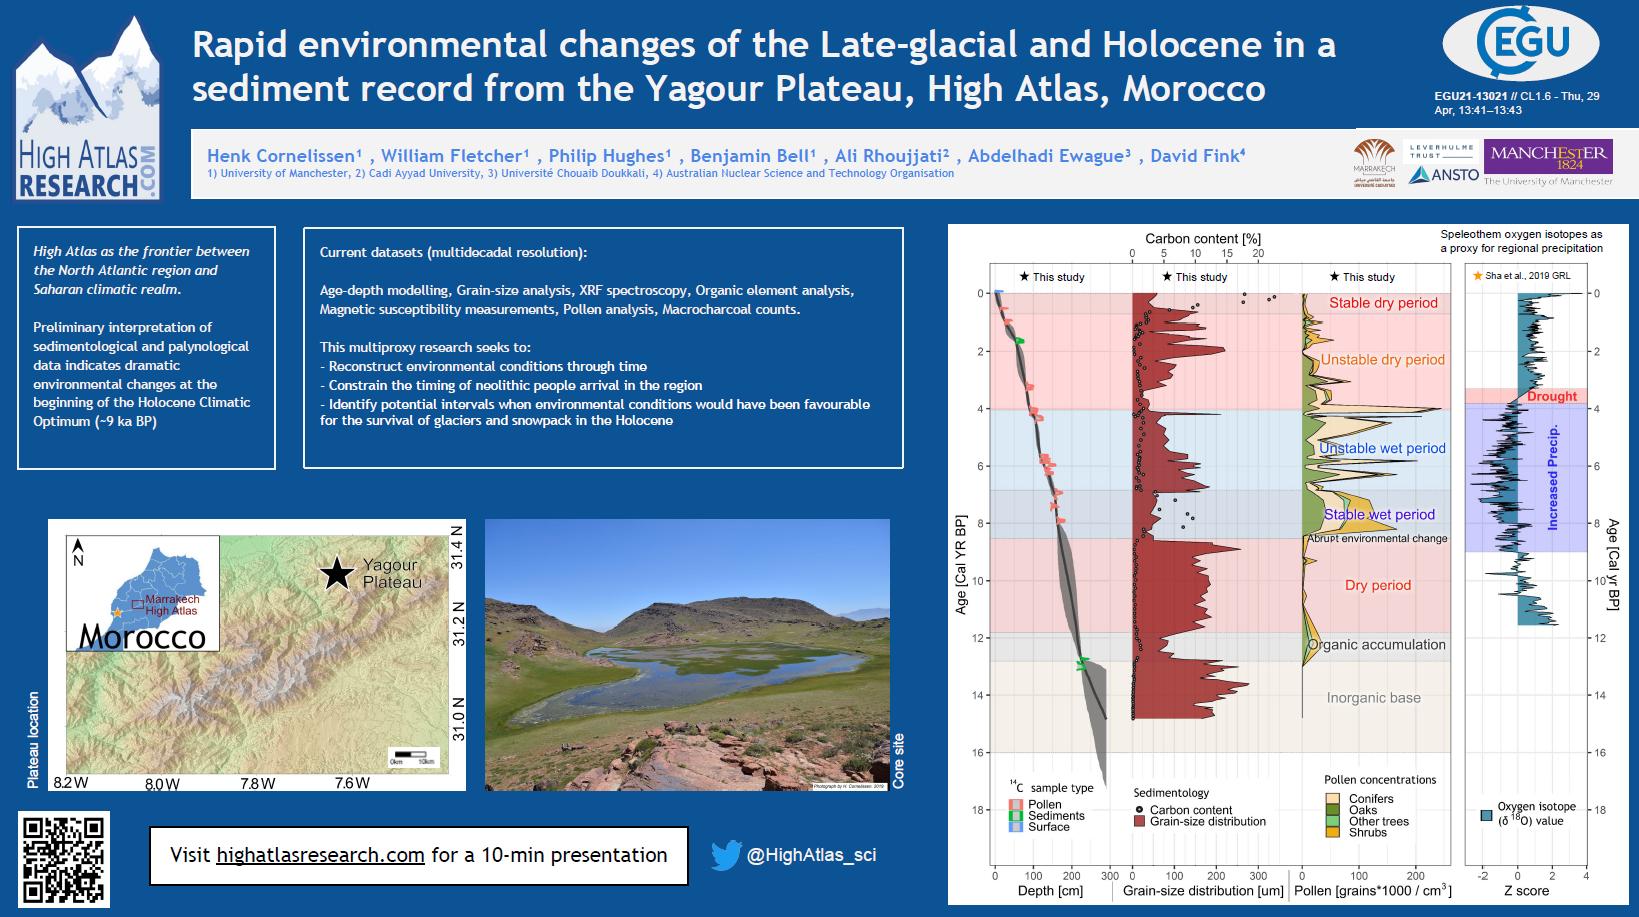 EGU 2021 - Palaeoenvironmental history at Yagour Plateau